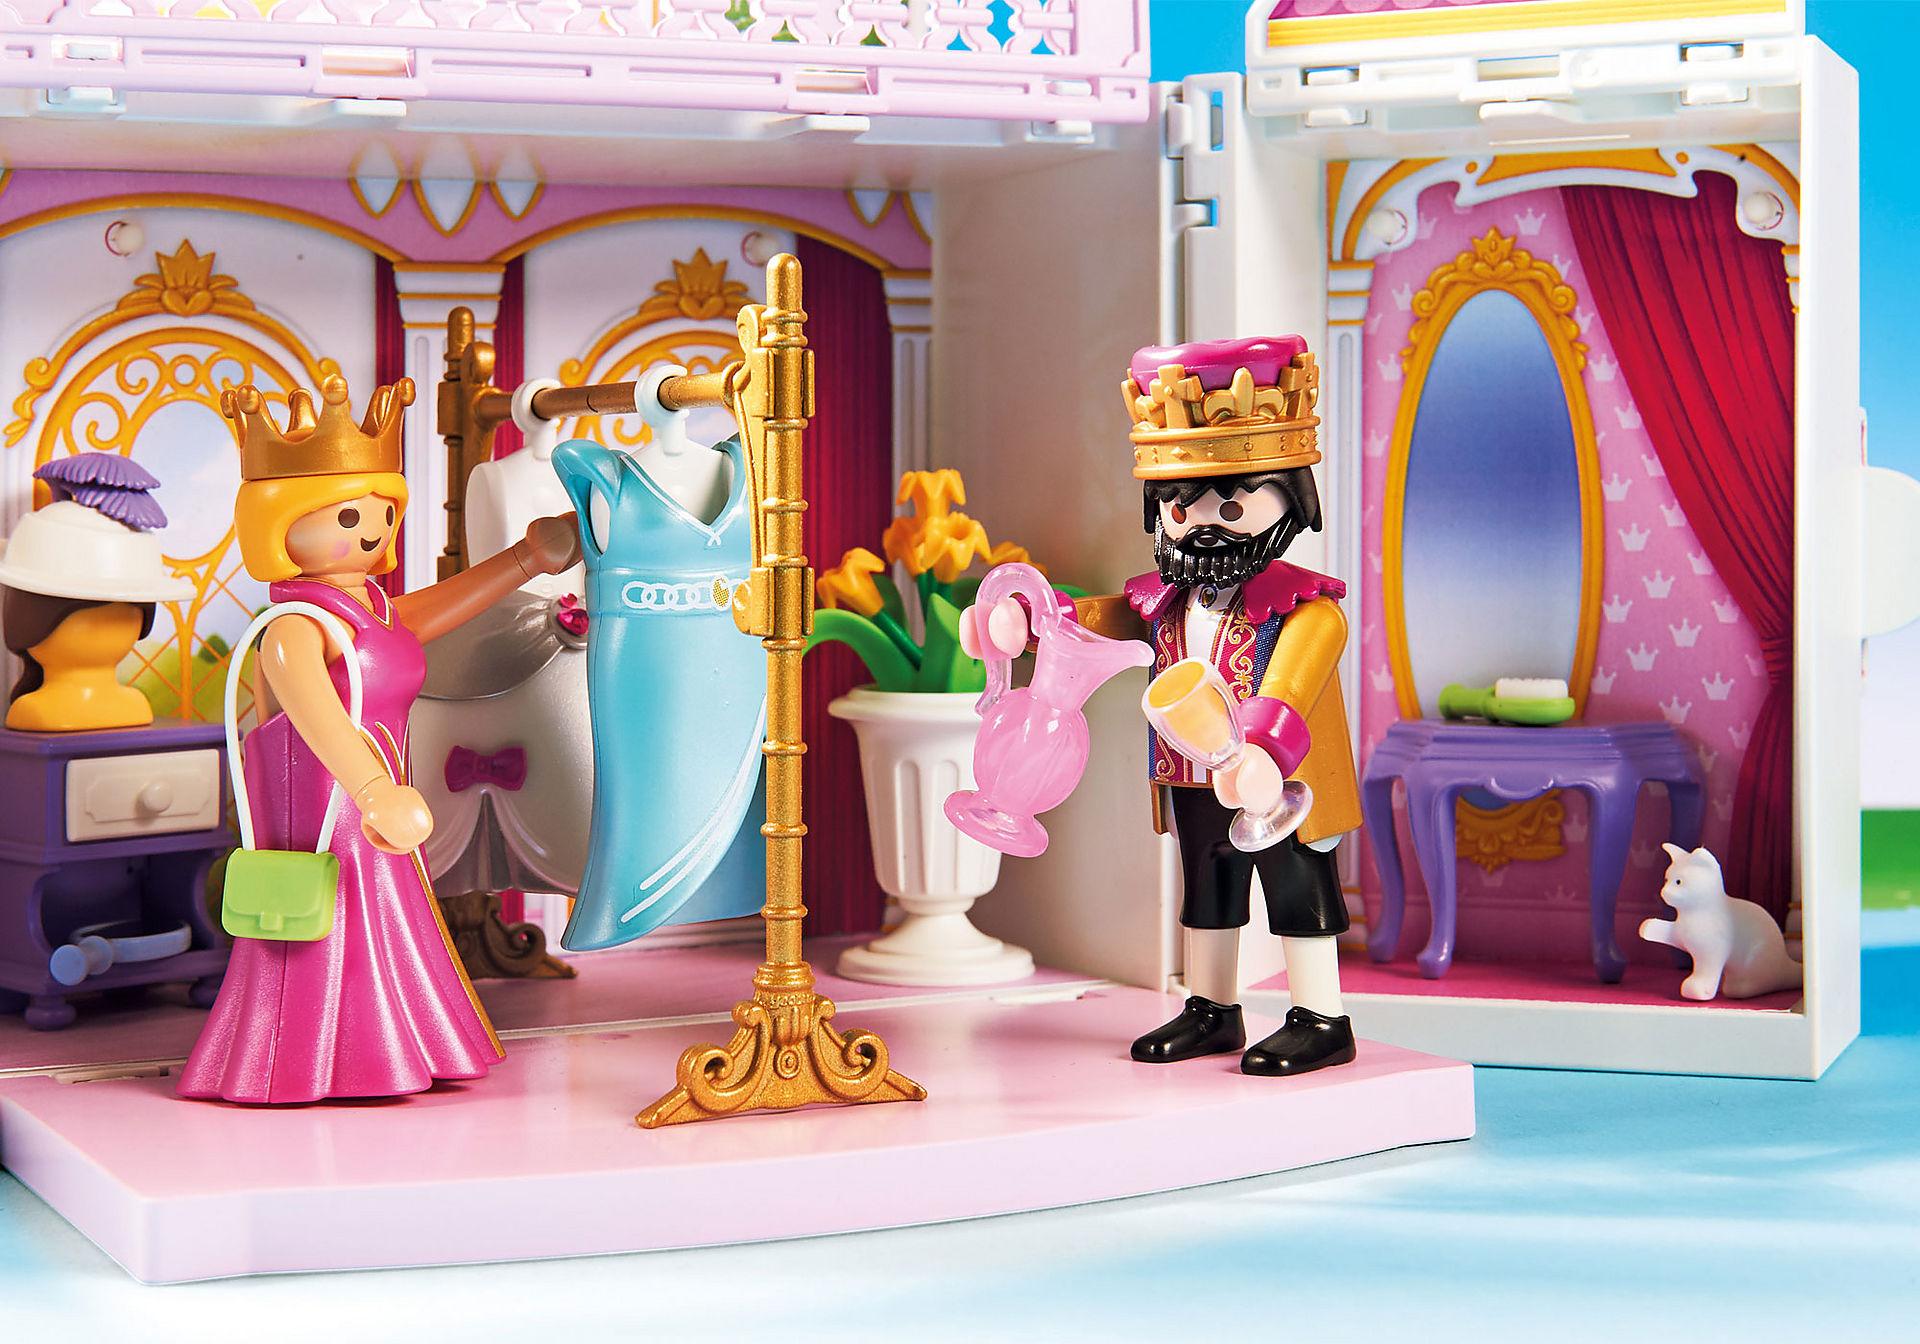 http://media.playmobil.com/i/playmobil/4898_product_extra1/My Secret Royal Palace Play Box